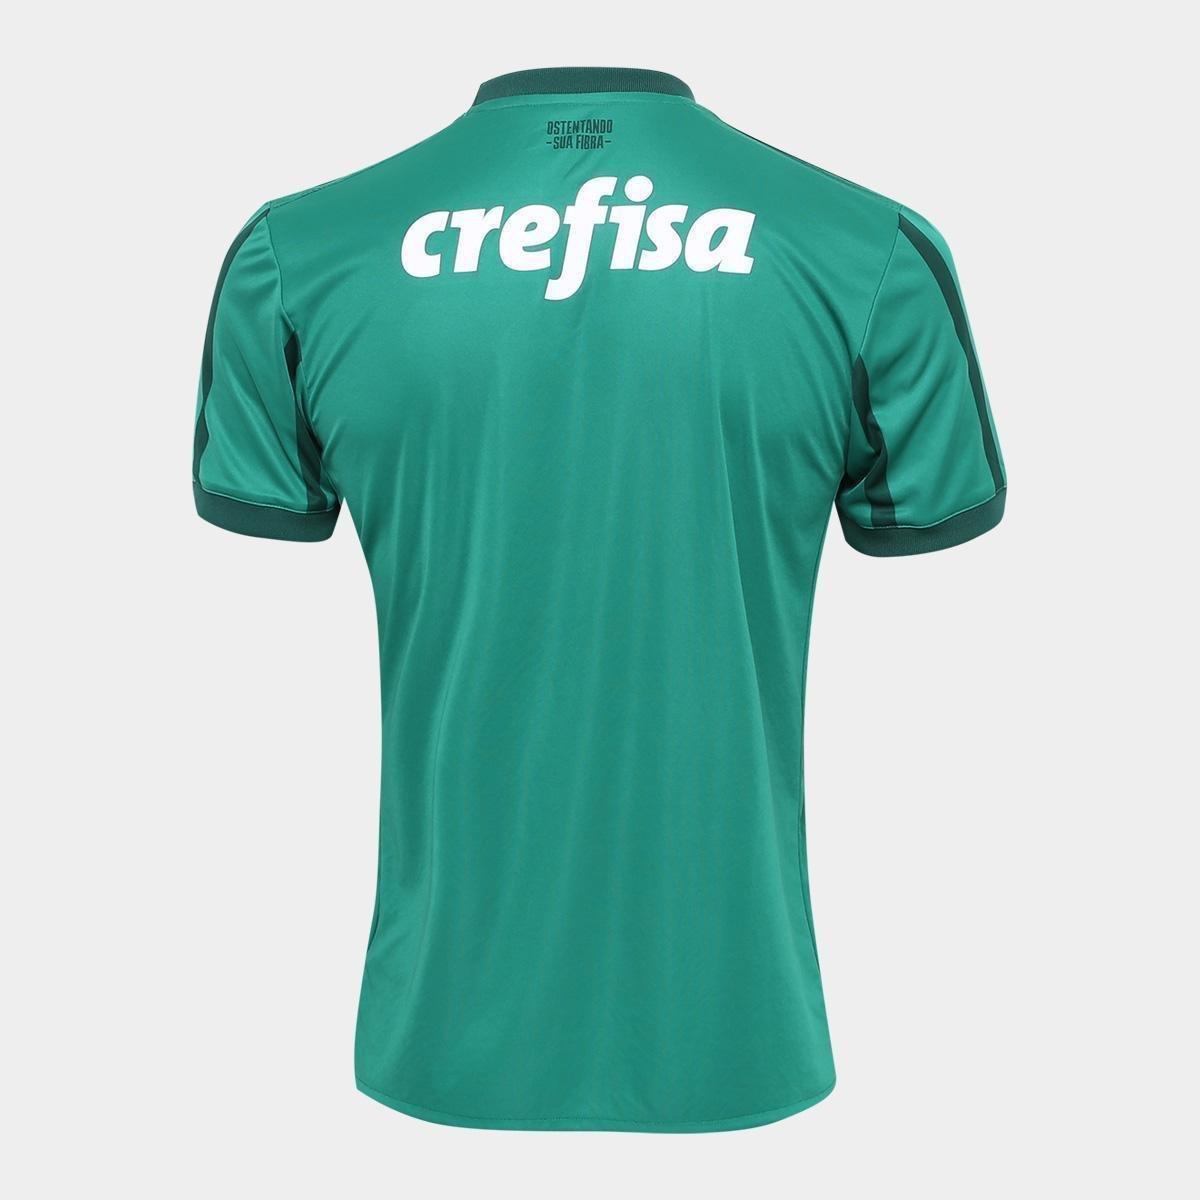 Camisa Palmeiras I 17 18 s nº Torcedor Adidas Masculina - Verde ... abfd6a45eabcb